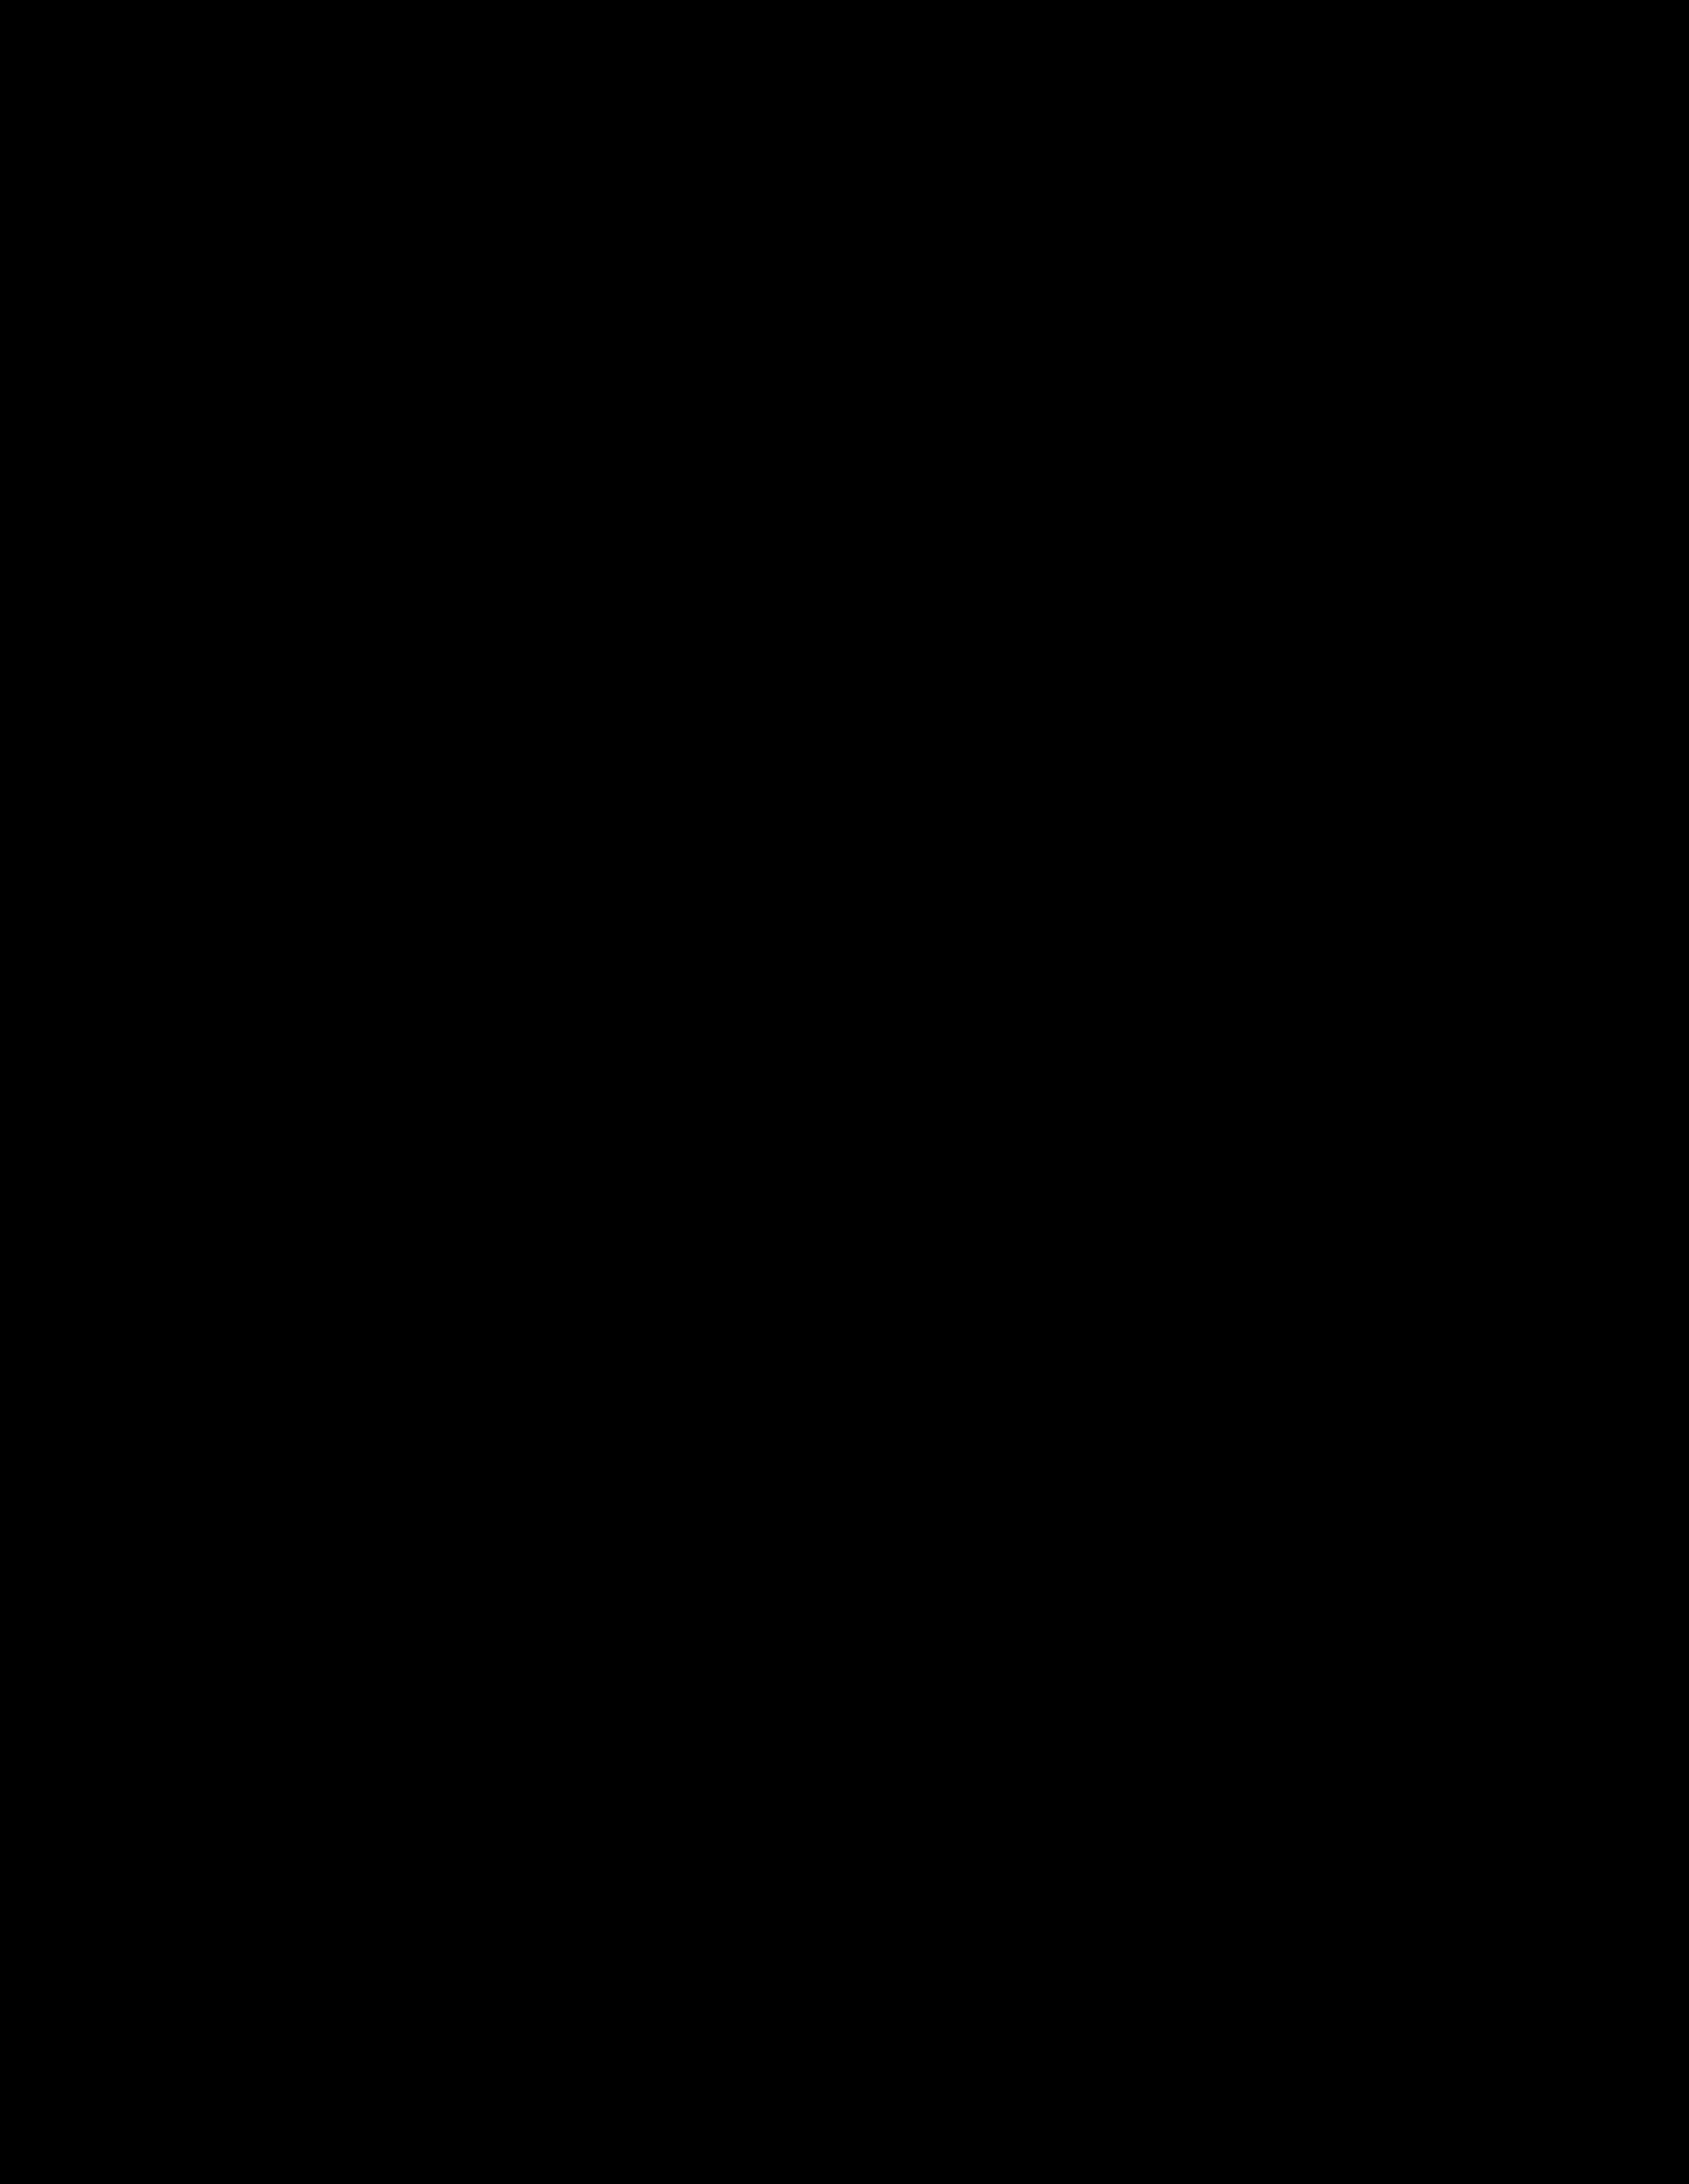 PNG Lobo - 61795